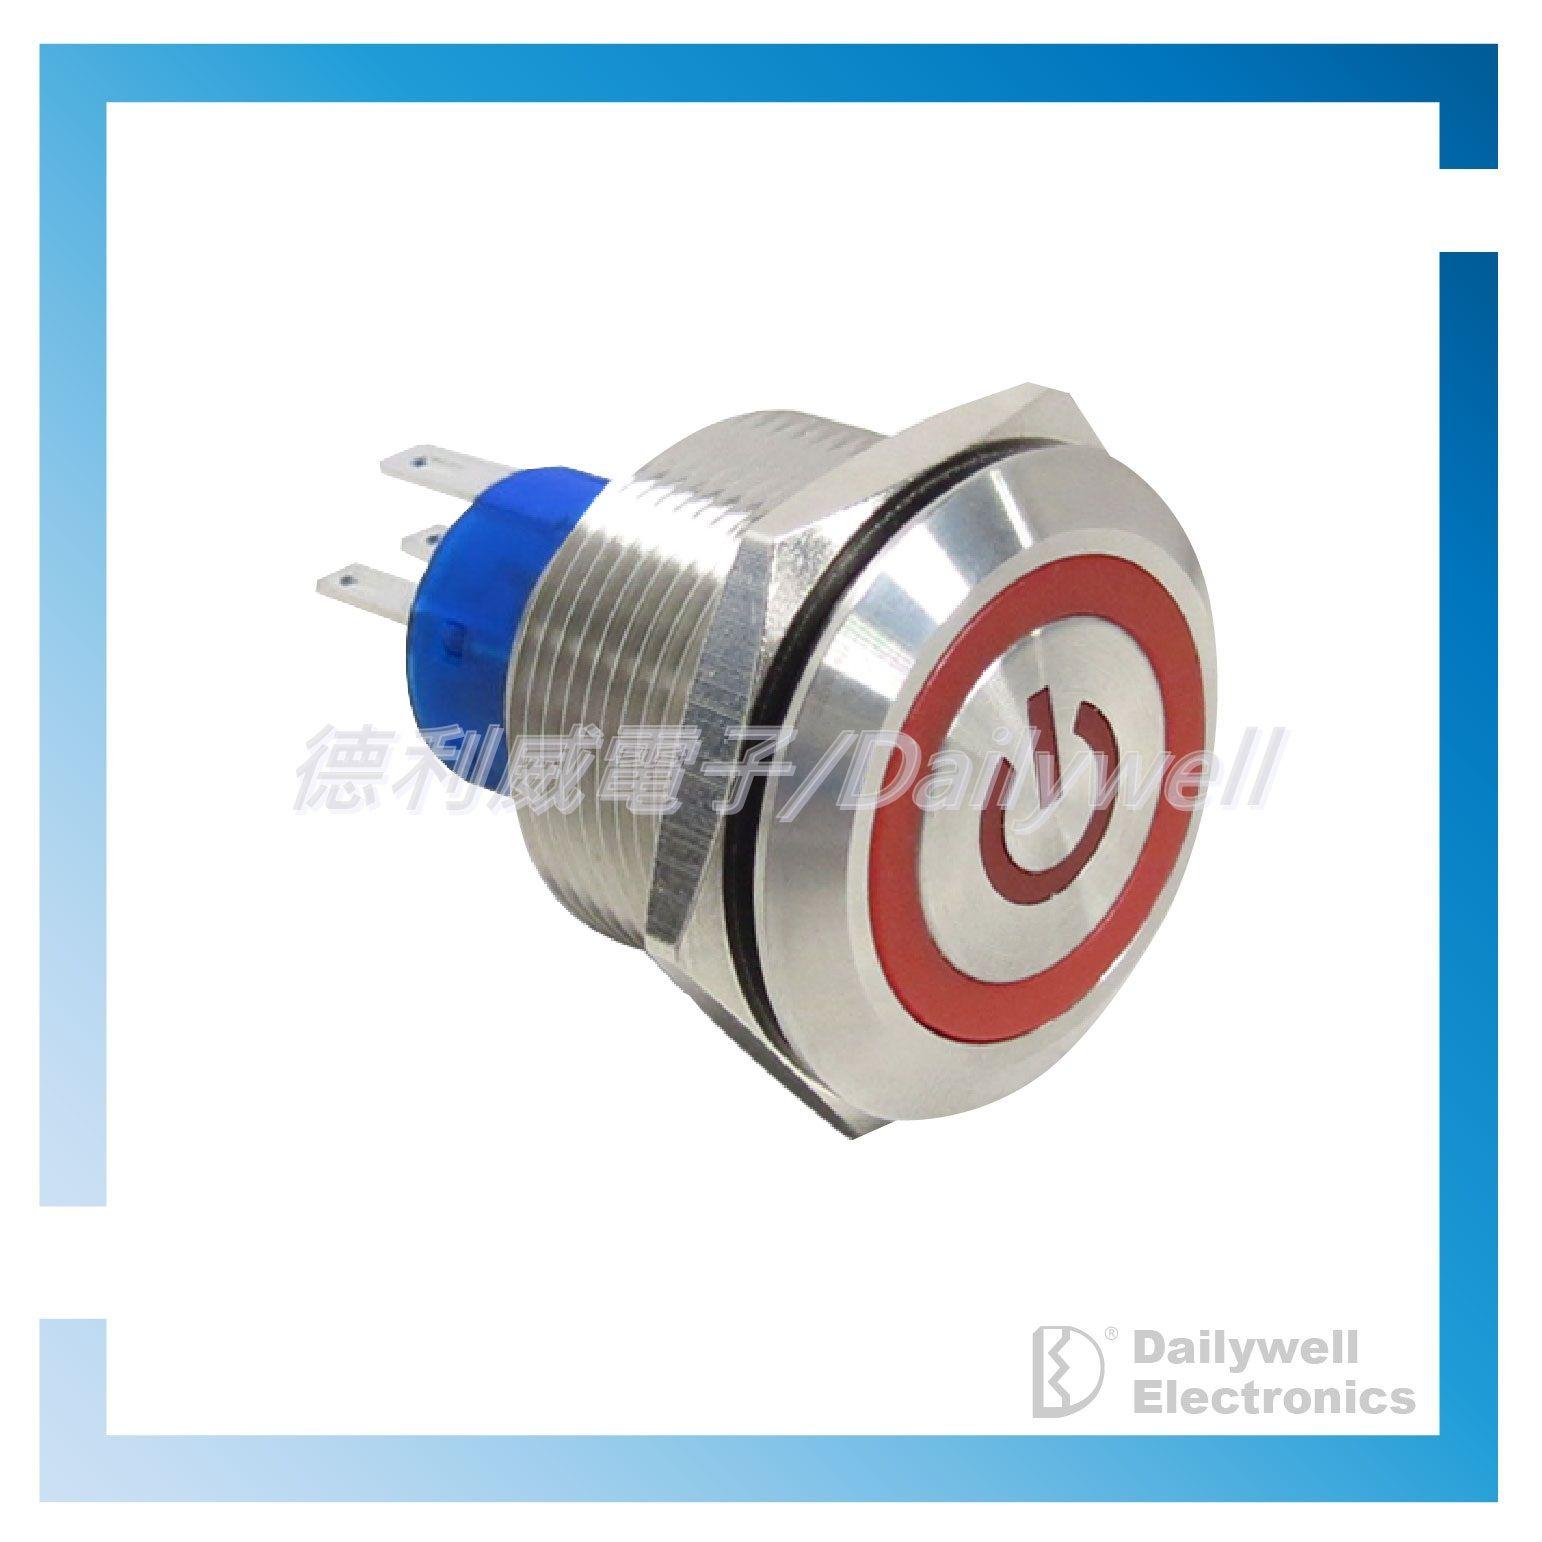 Interruttori a pulsante antivandalo da 25 mm